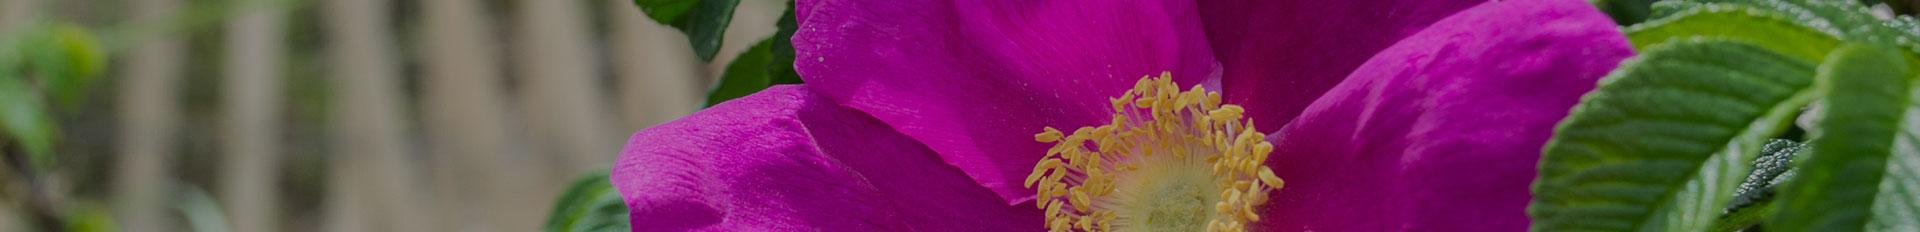 About Us | Gorgen Funeral Services